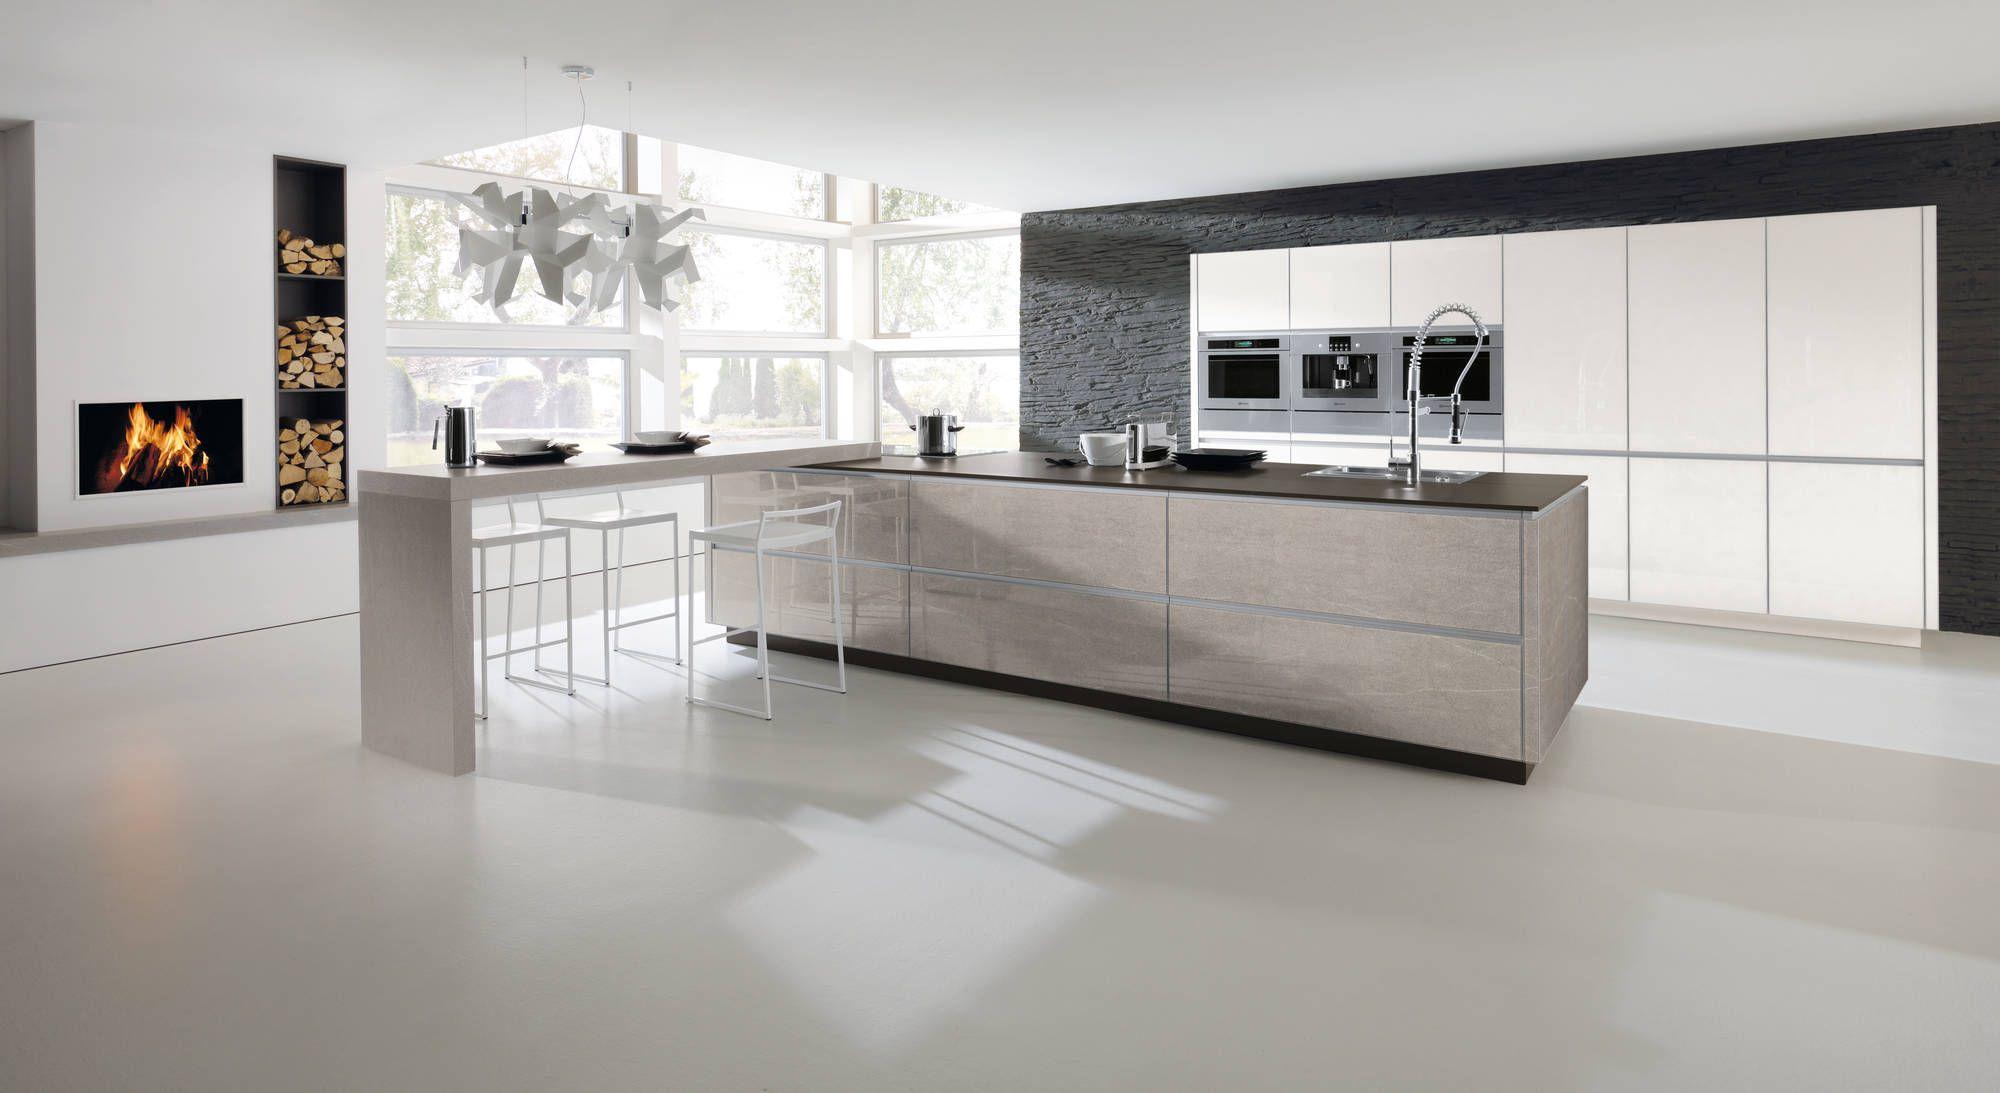 Alno Fronts In Stone Glass Sleek Kitchen Stylish Kitchen White Modern Kitchen